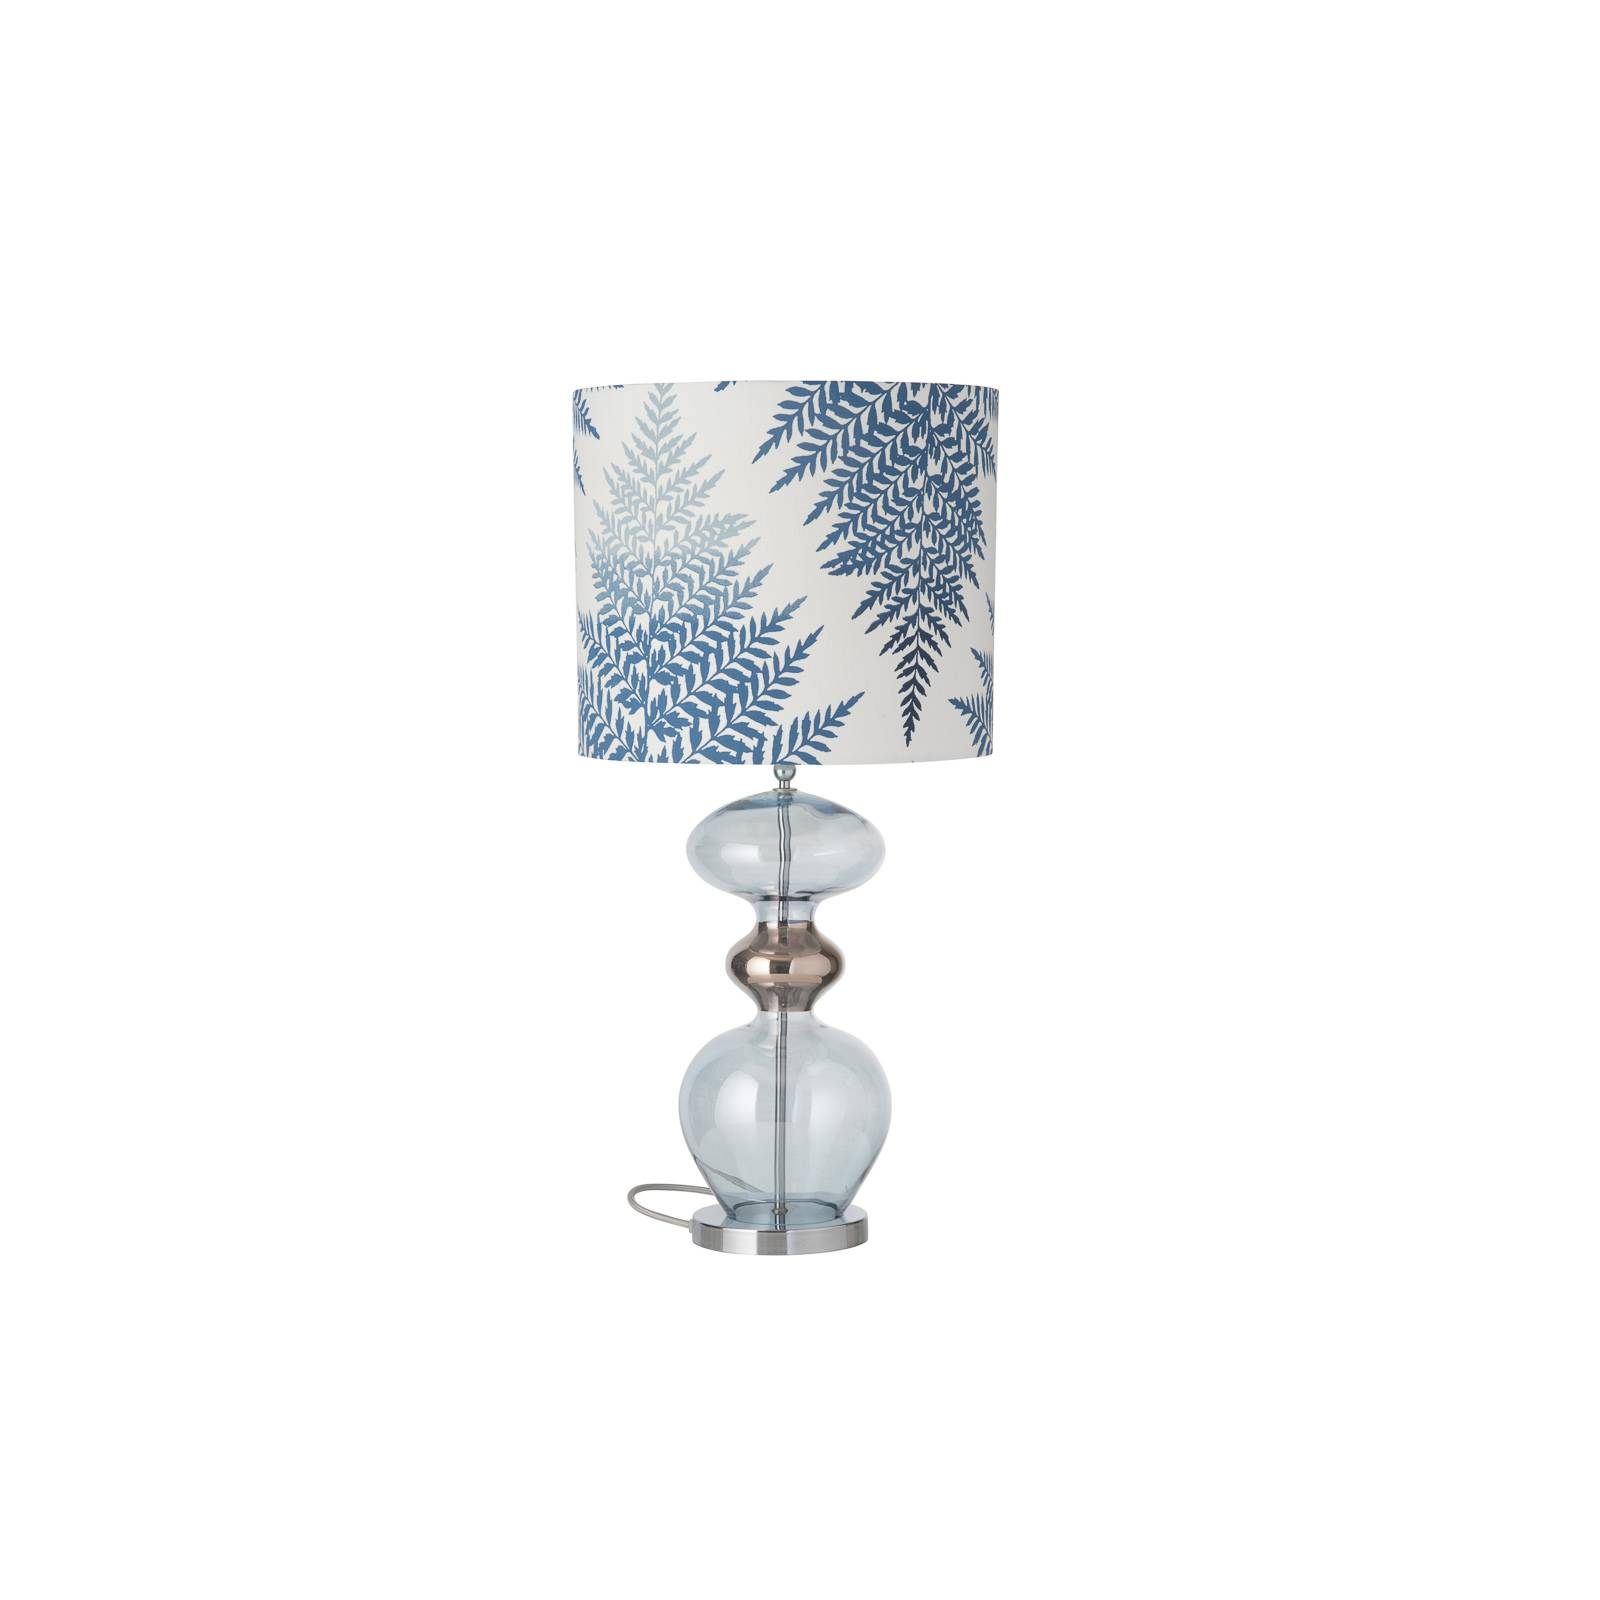 EBB & FLOW Futura lampe à poser Fern Leaves indigo